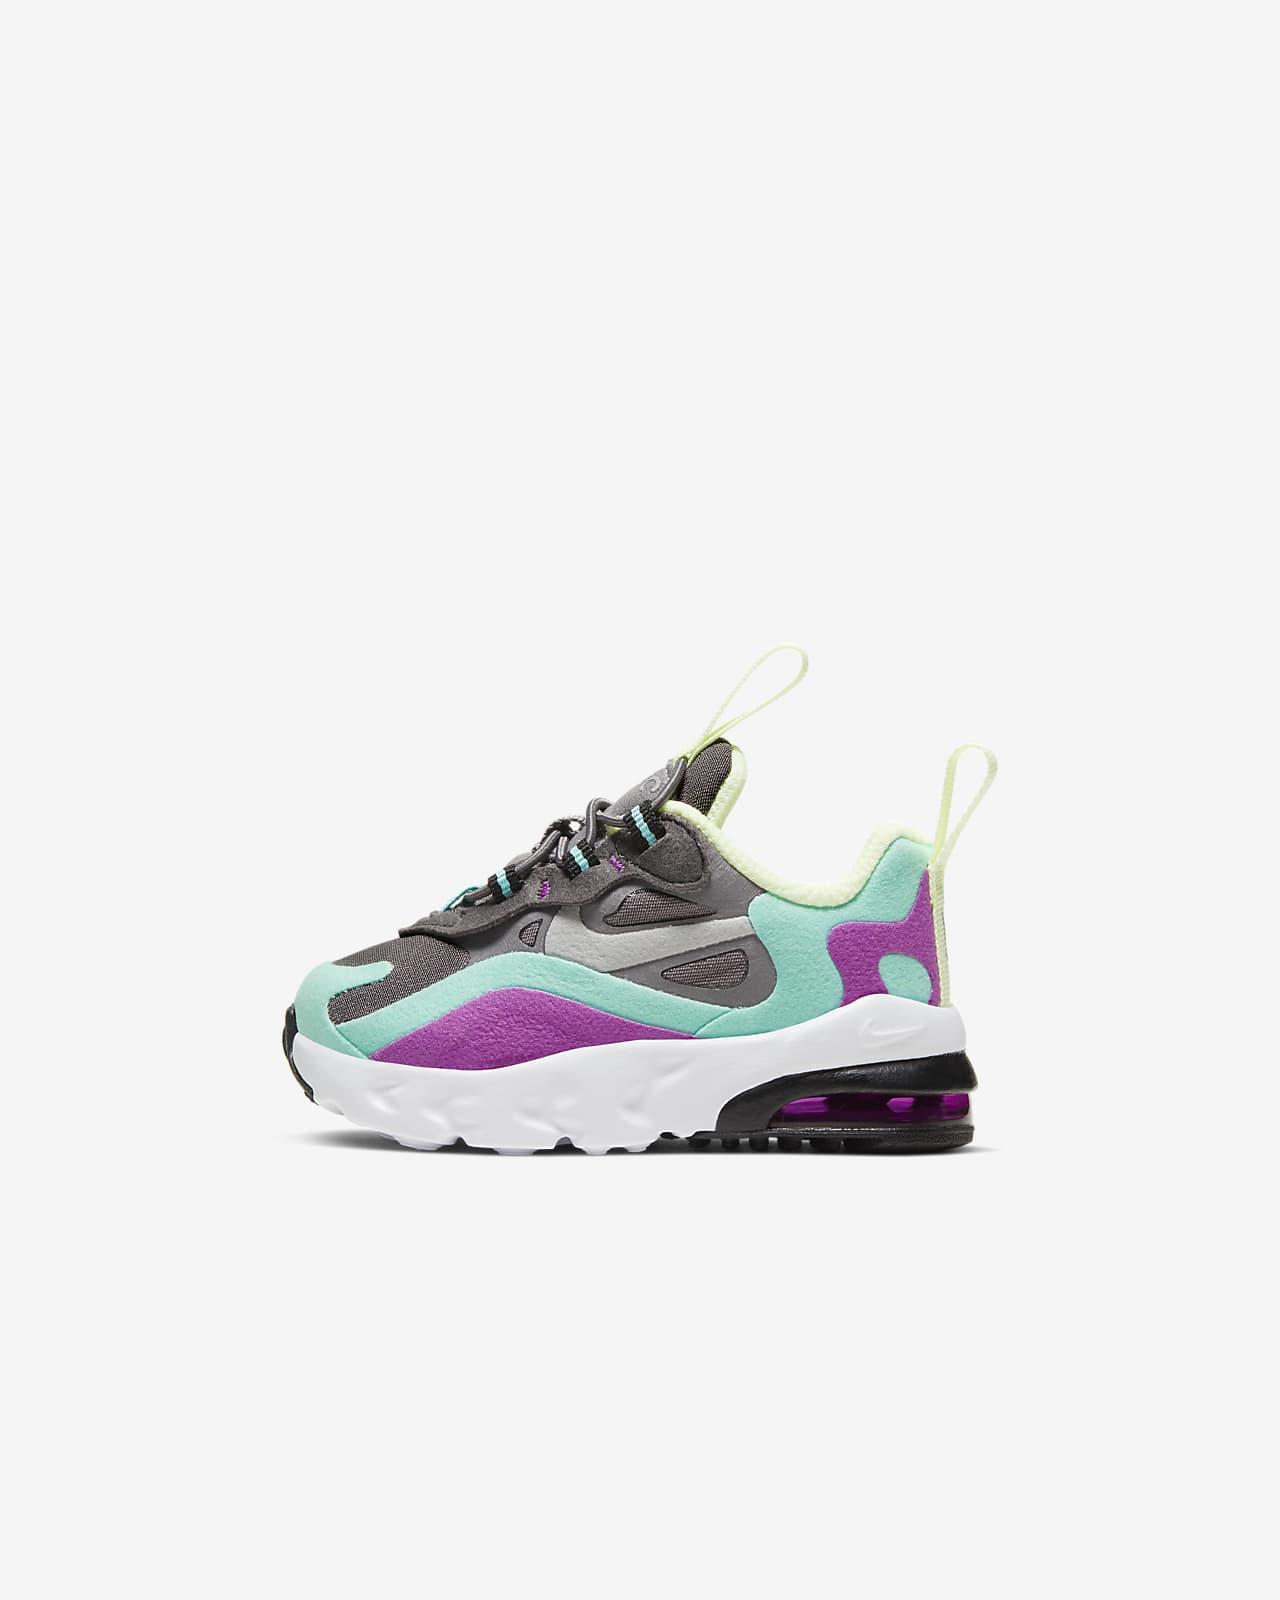 Sbrigati insediamento morale  Scarpa Nike Air Max 270 RT - Neonati/Bimbi piccoli. Nike IT